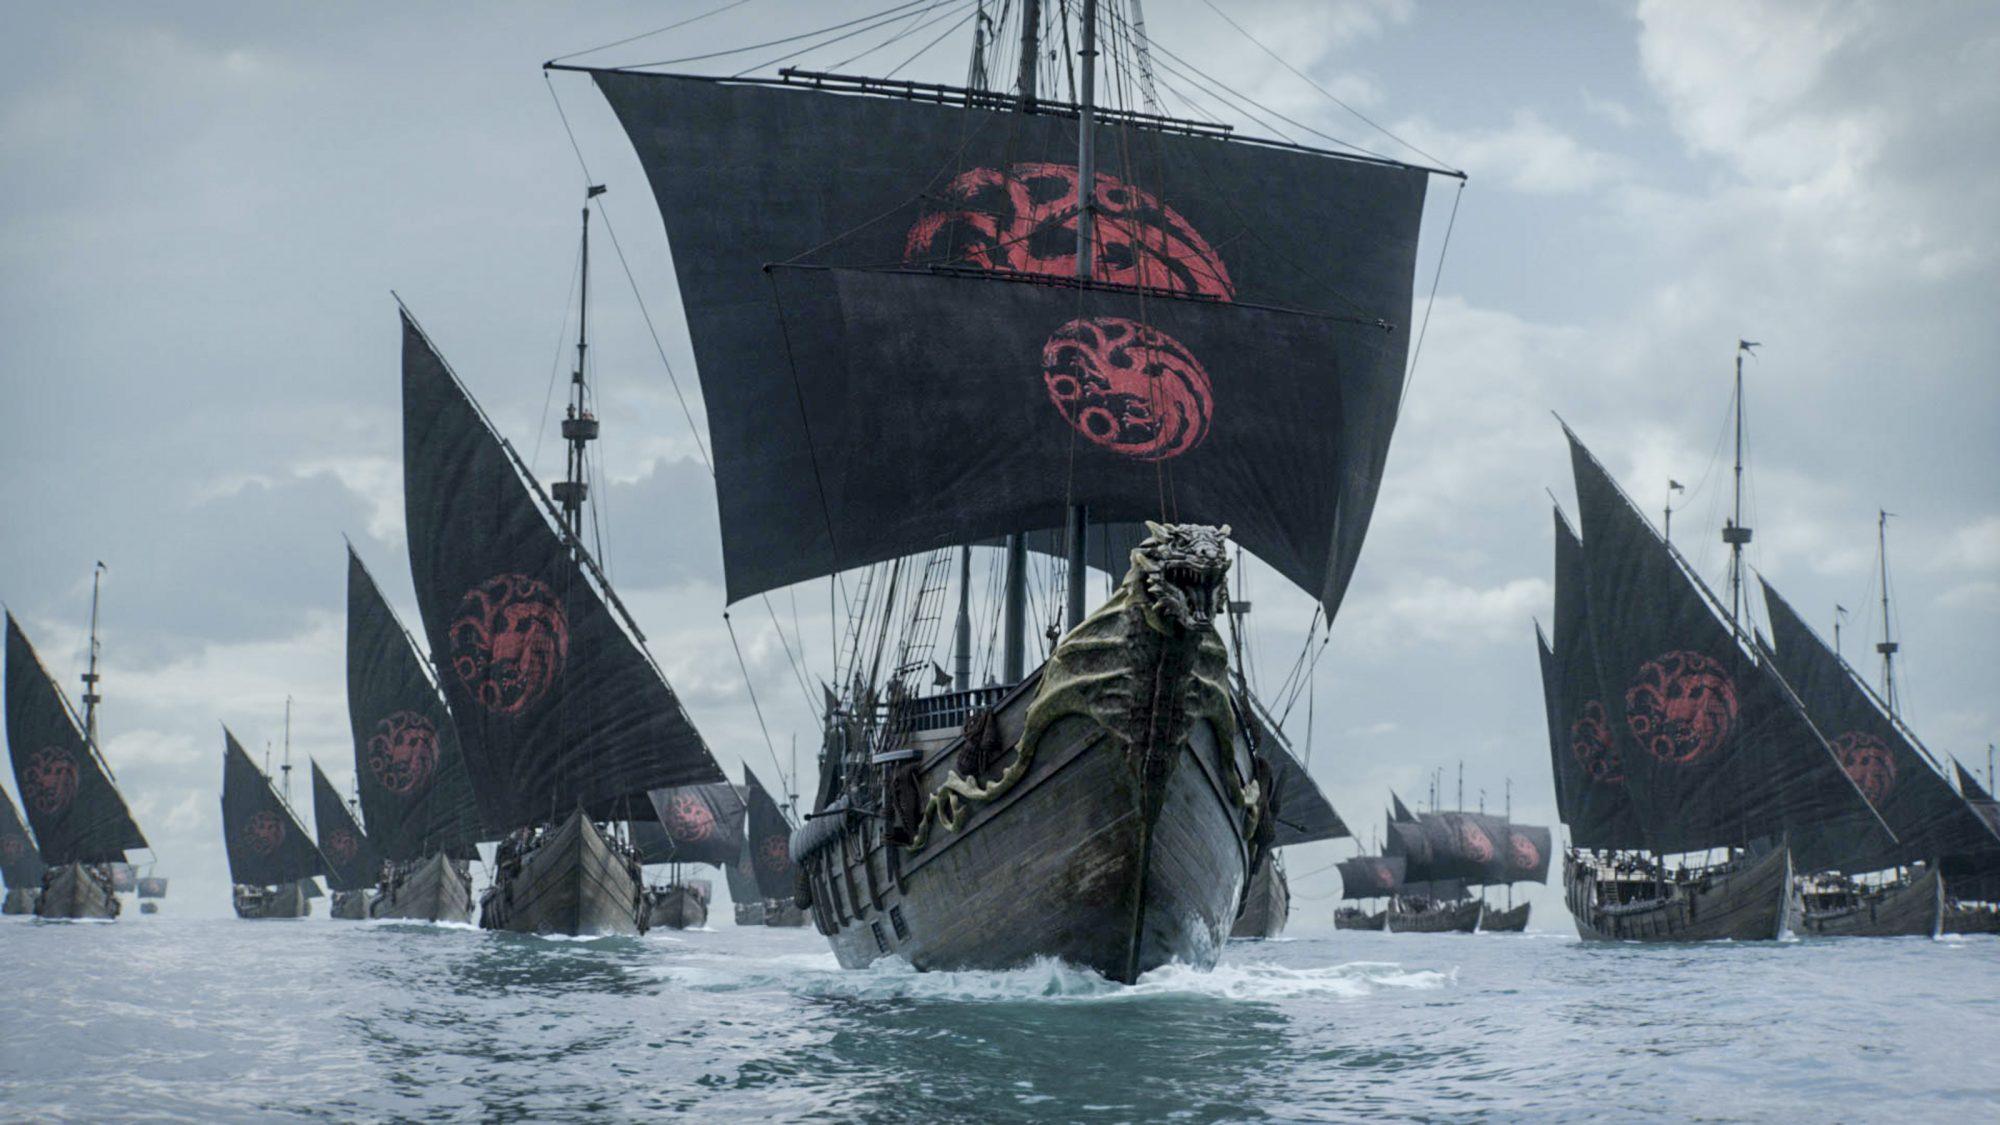 Game of Thrones Season 8, Episode 4 Photo: Courtesy of HBO